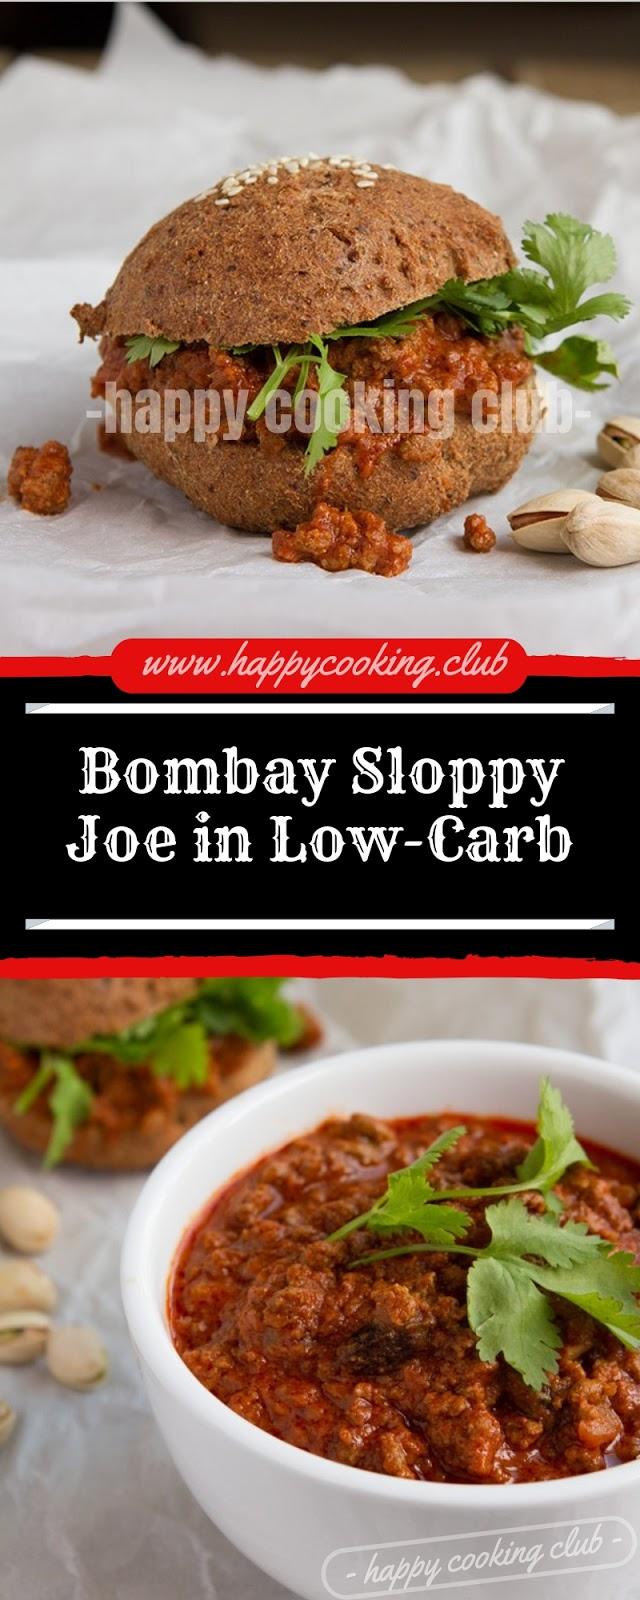 Bombay Sloppy Joe in Low-Carb